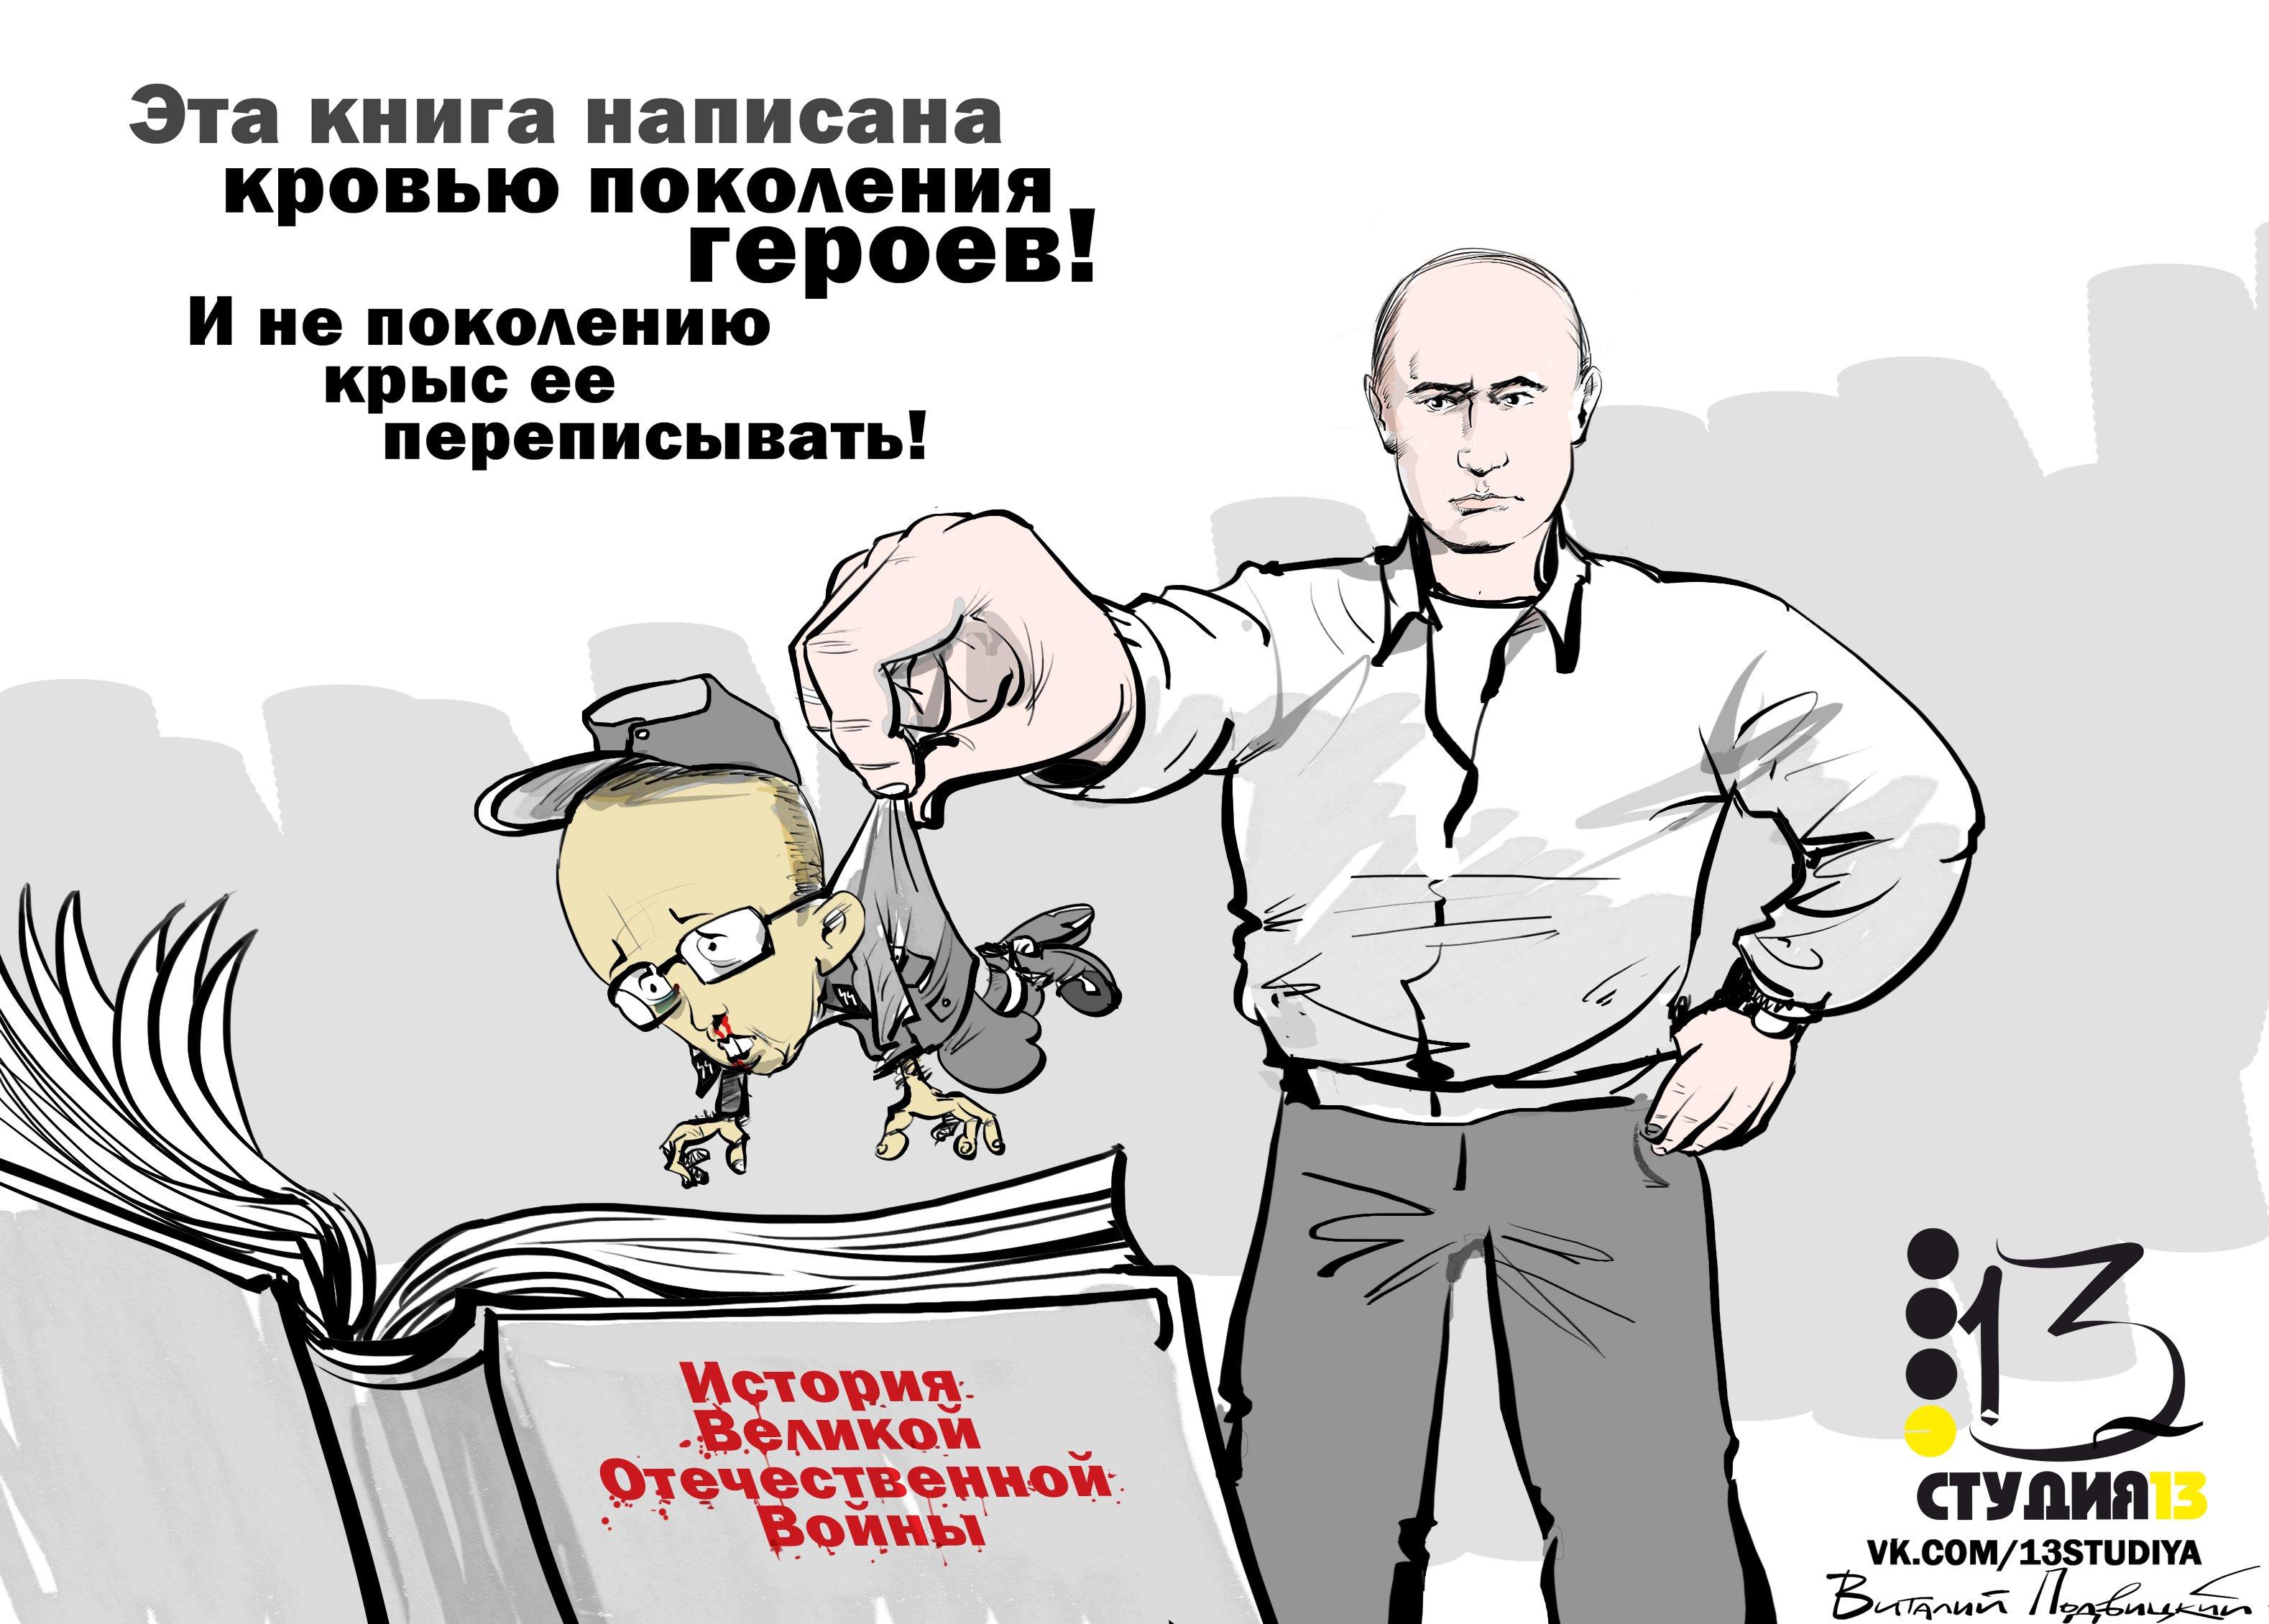 Карикатура на Ту-154 Charlie Hebdo